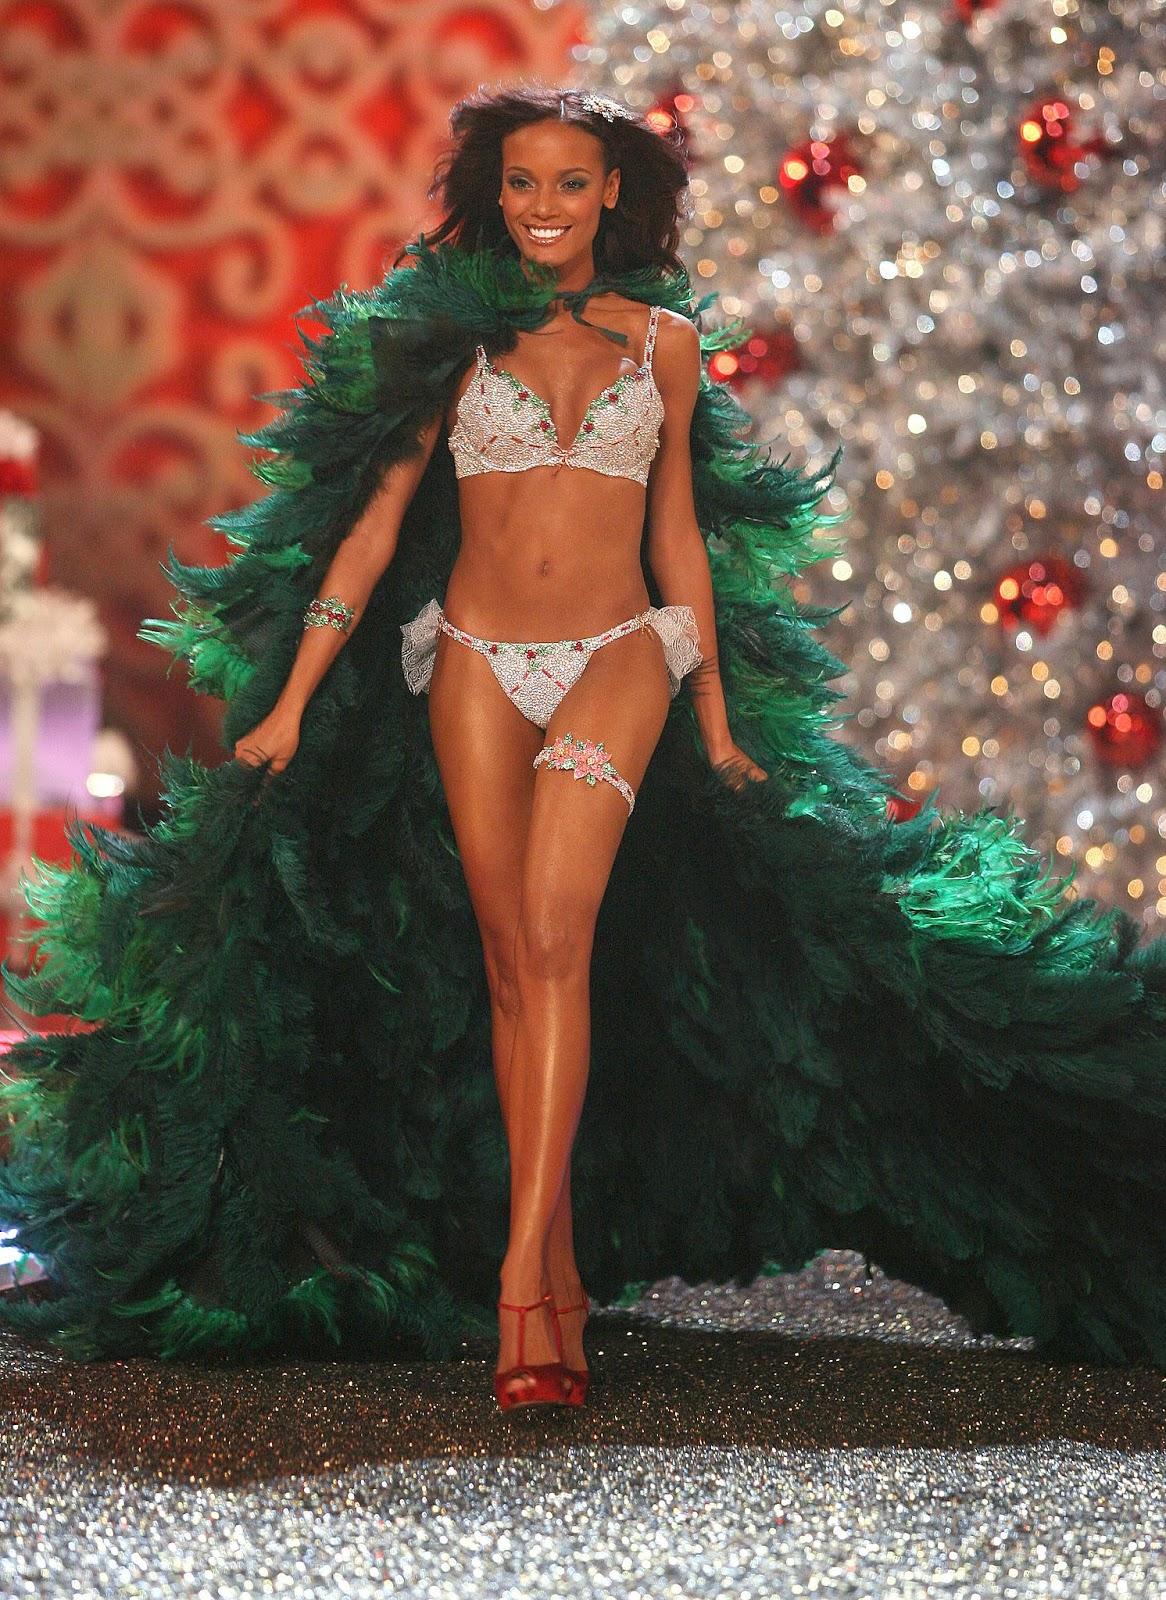 Selita Ebanks - Holiday Fantasy Bra (2007)